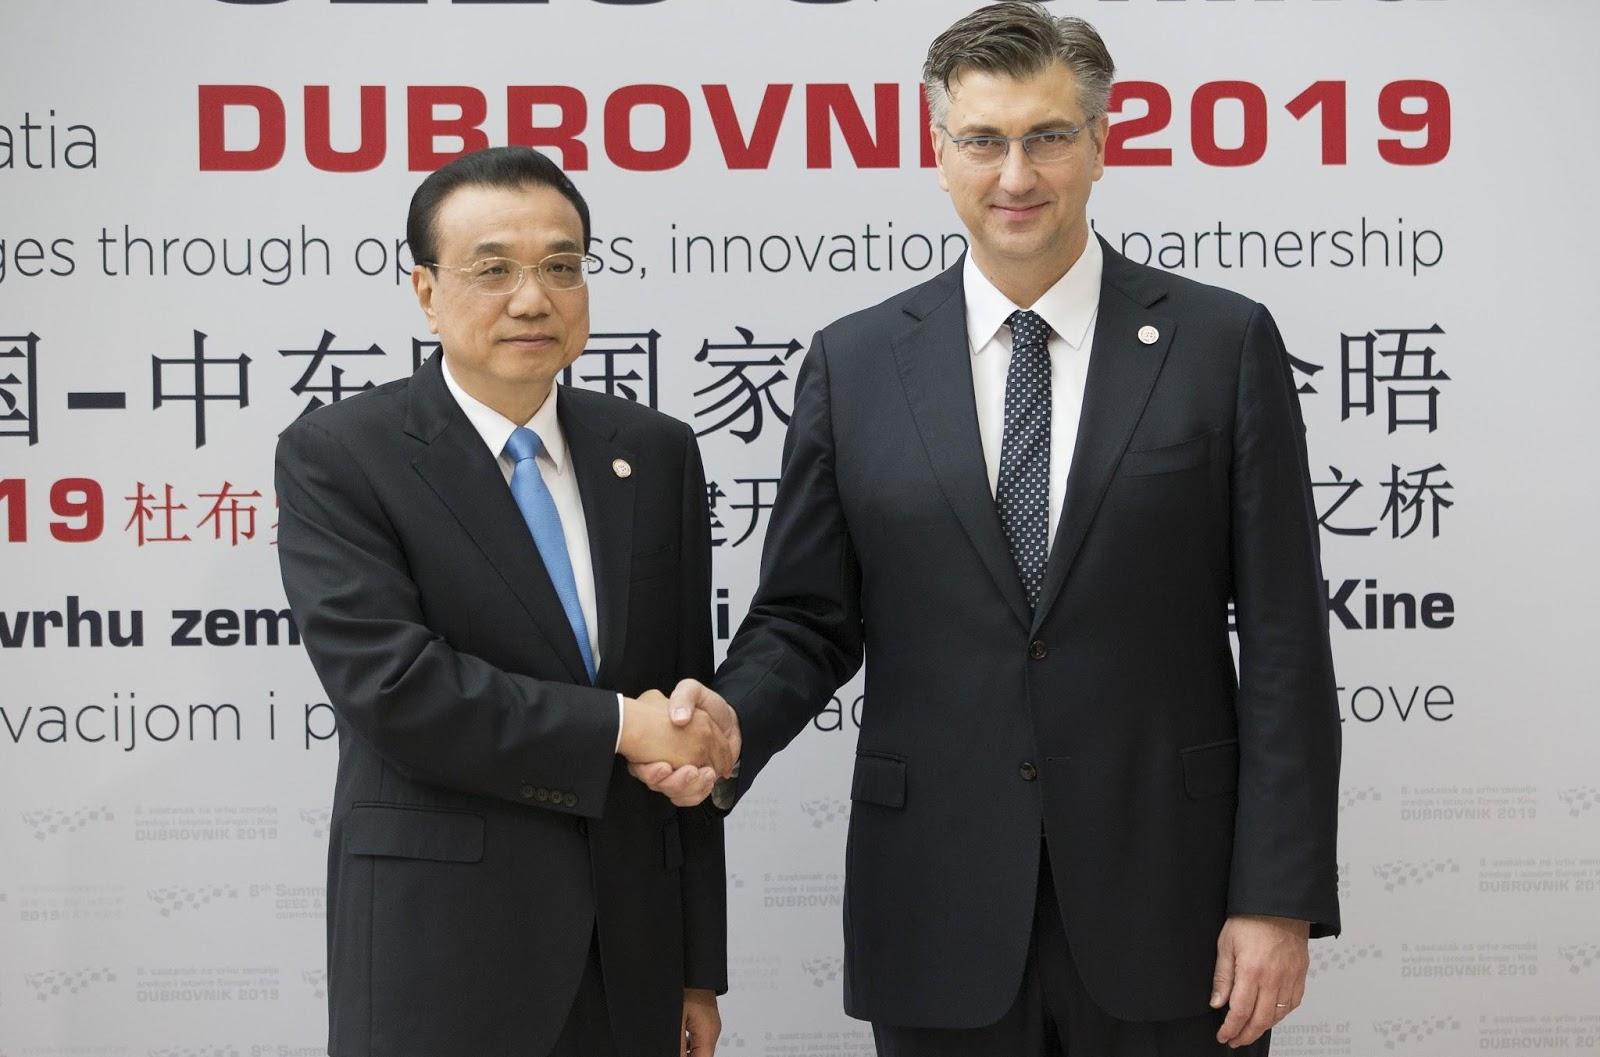 Croatian PM Andrej Plenkovic welcomes Chinese PM Li Keqiang at the 16+1 Summit held in Croatia. Photo.    Source: AP Photo/Darko Bandic